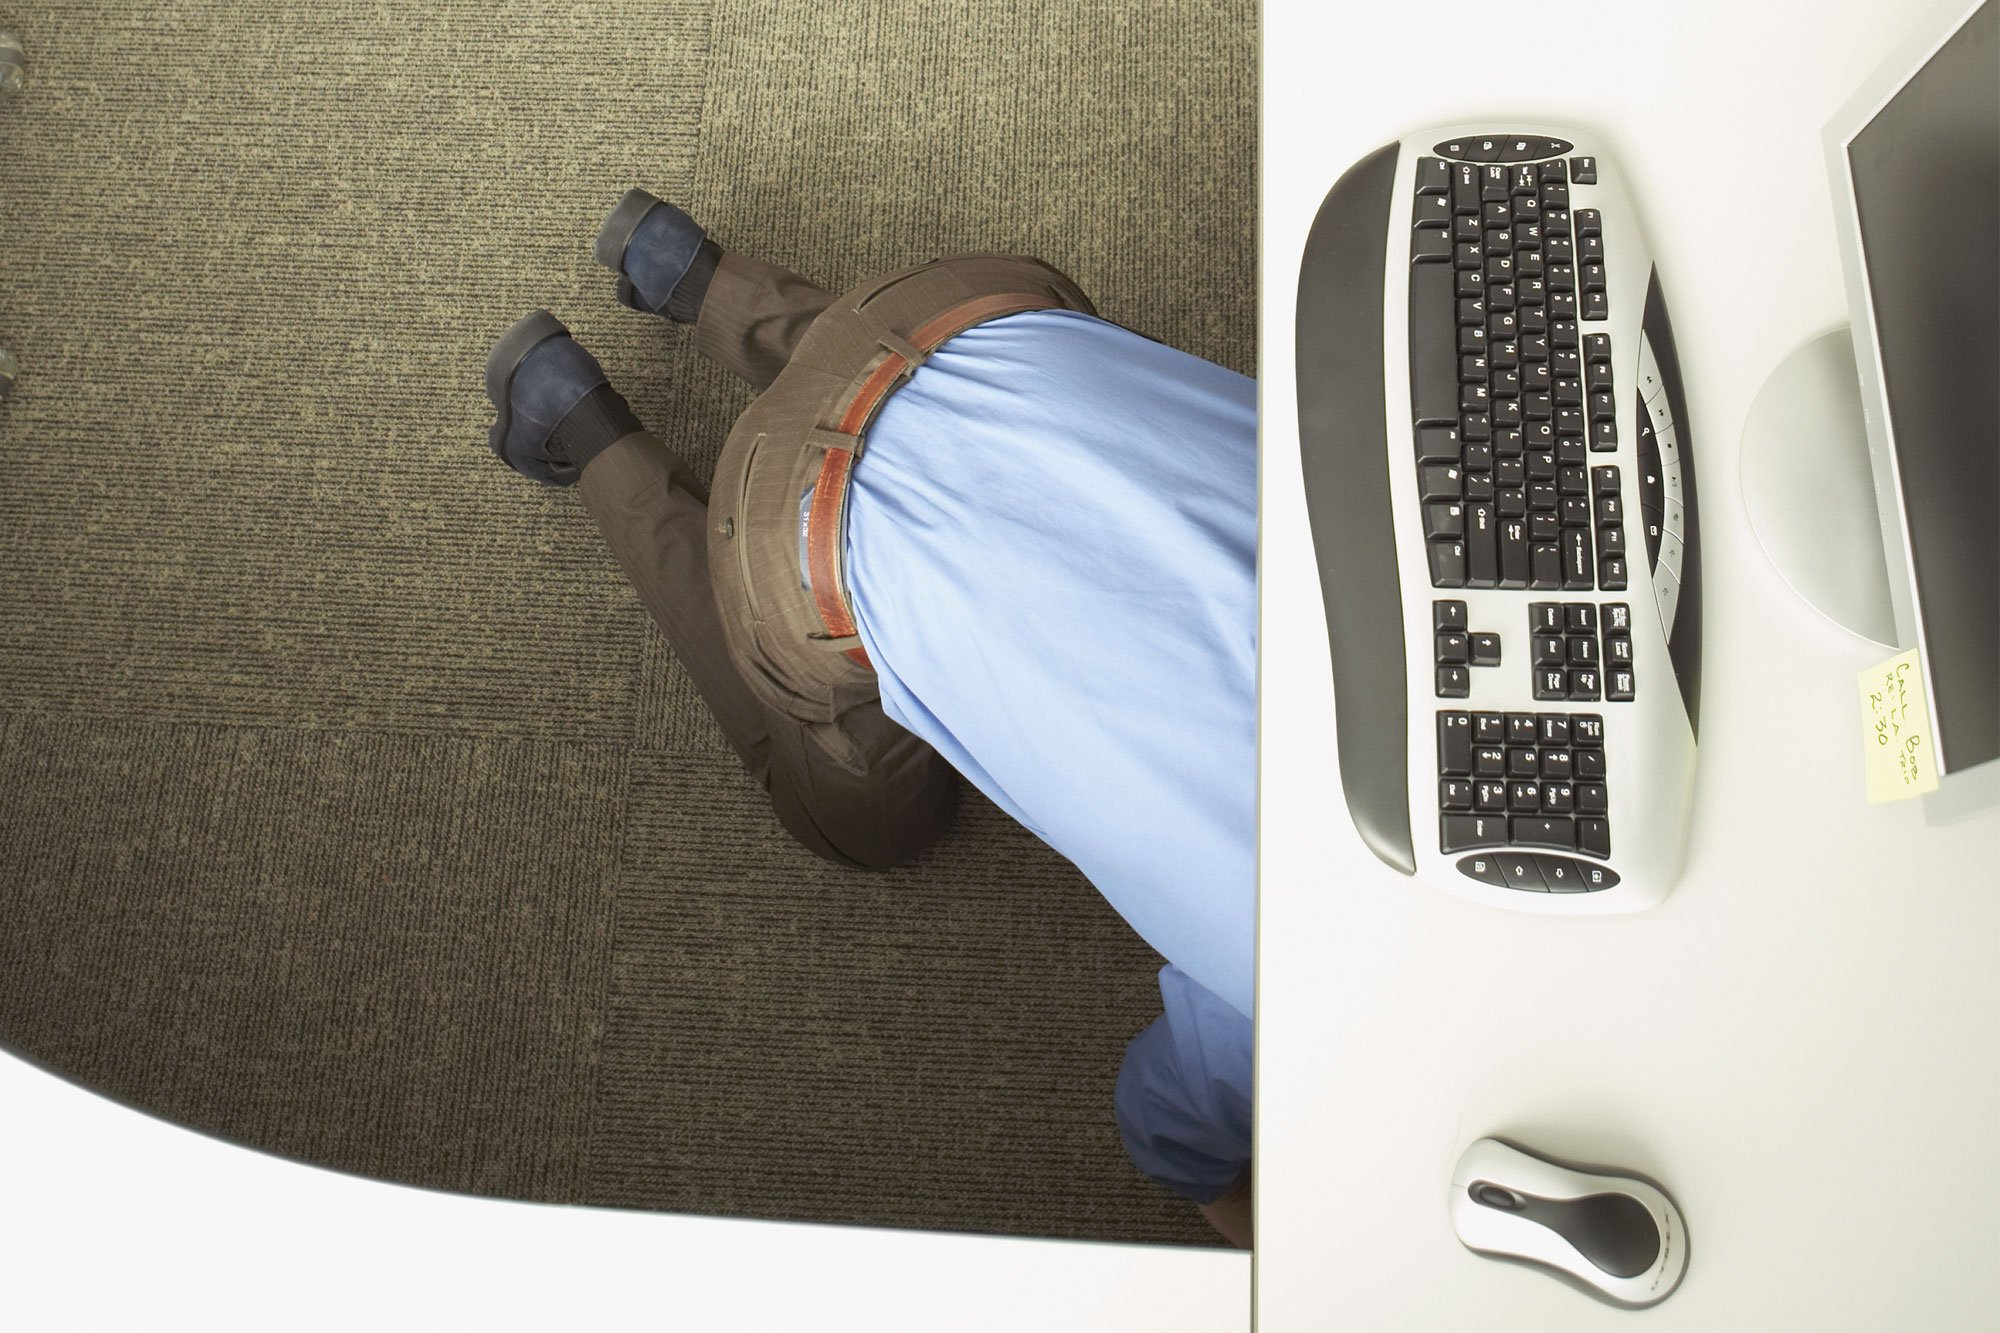 hiding under desk